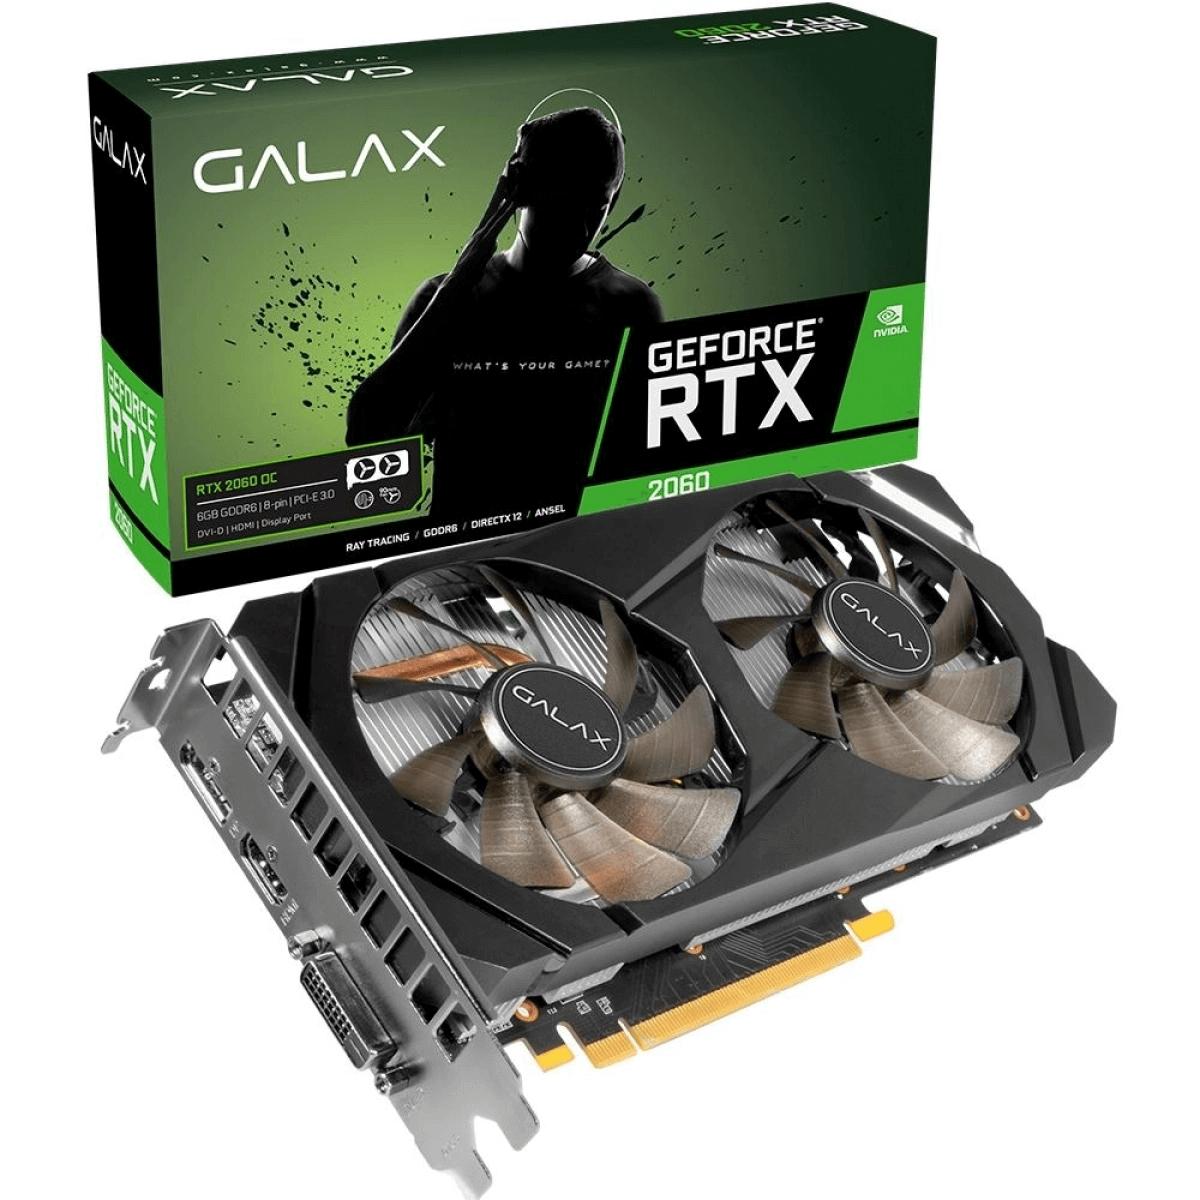 Placa de Vídeo Galax GeForce RTX 2060 1Click OC 6GB GDDR6 192Bit 26NRL7HPX7OC